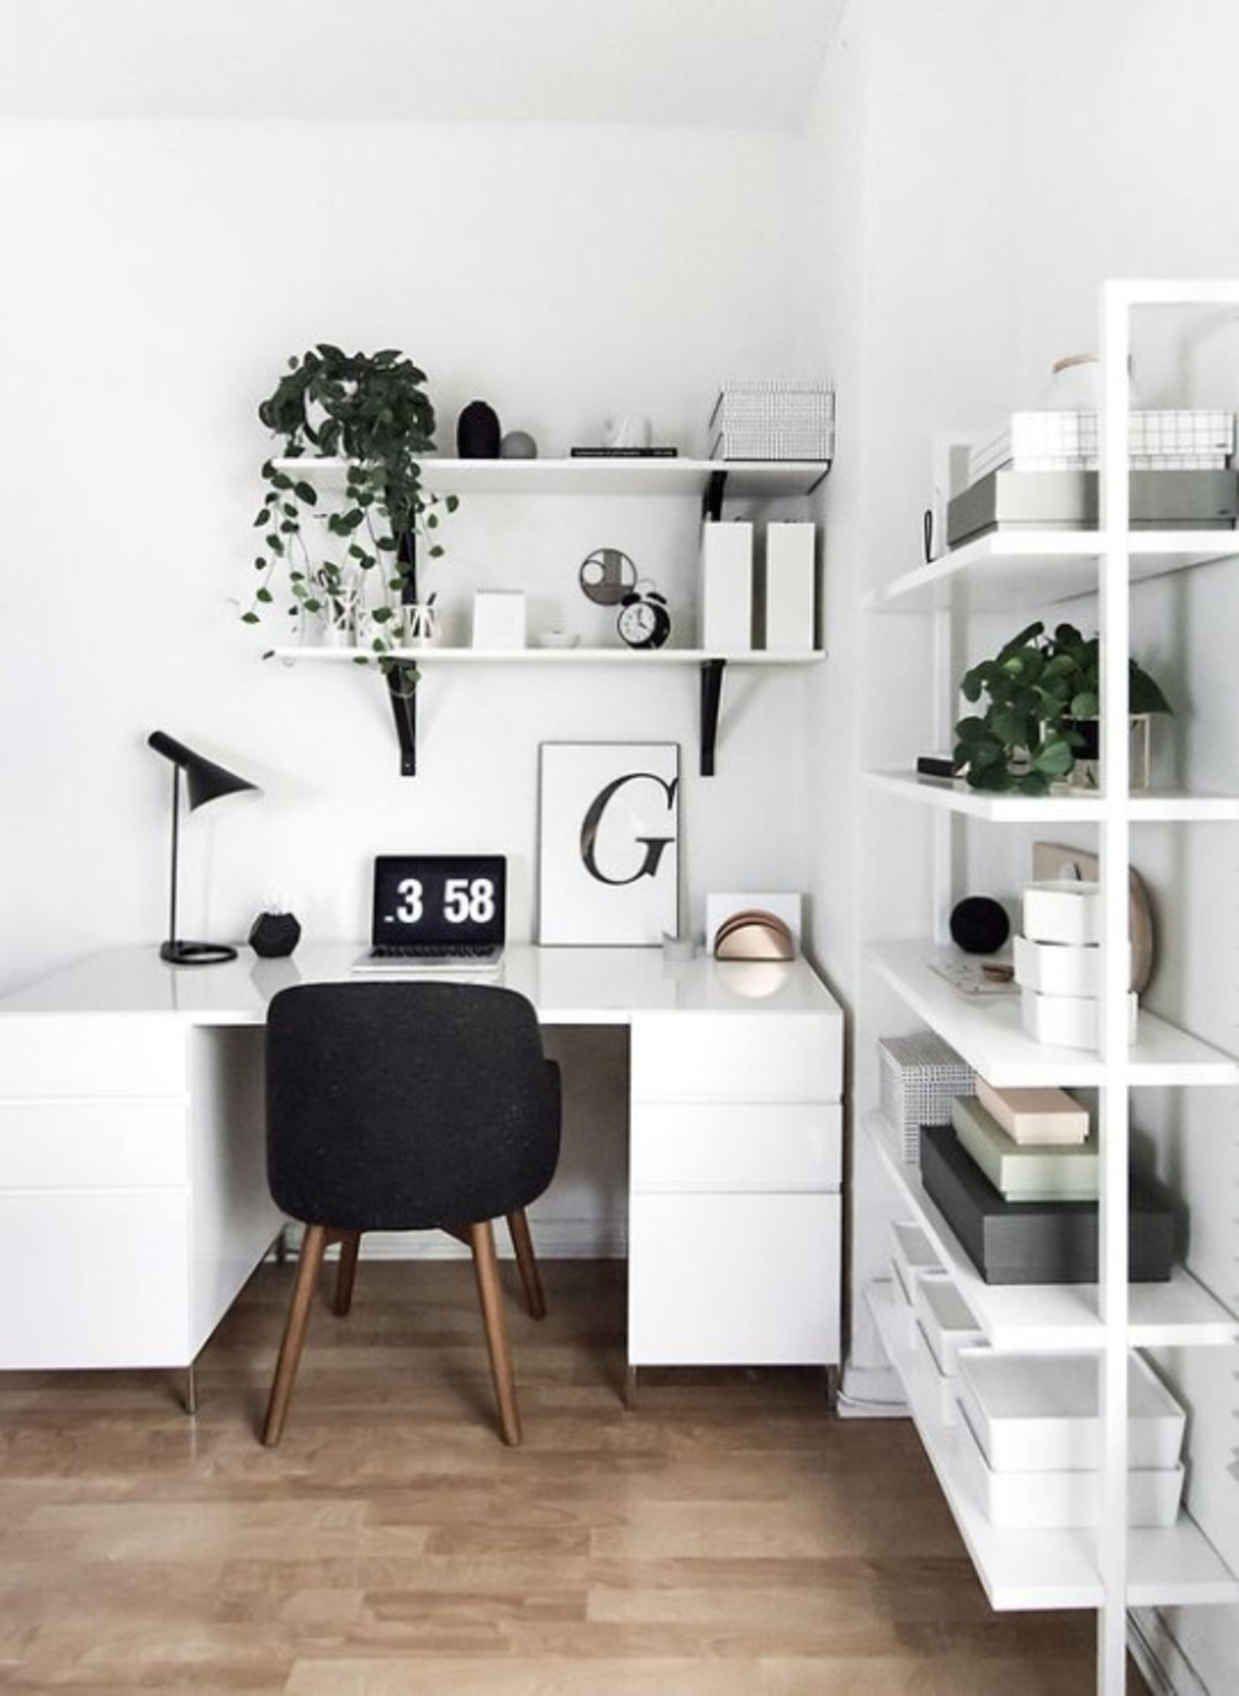 Minimal Interior Design Inspiration #62 - UltraLinx                                                                                                                                                                                 More